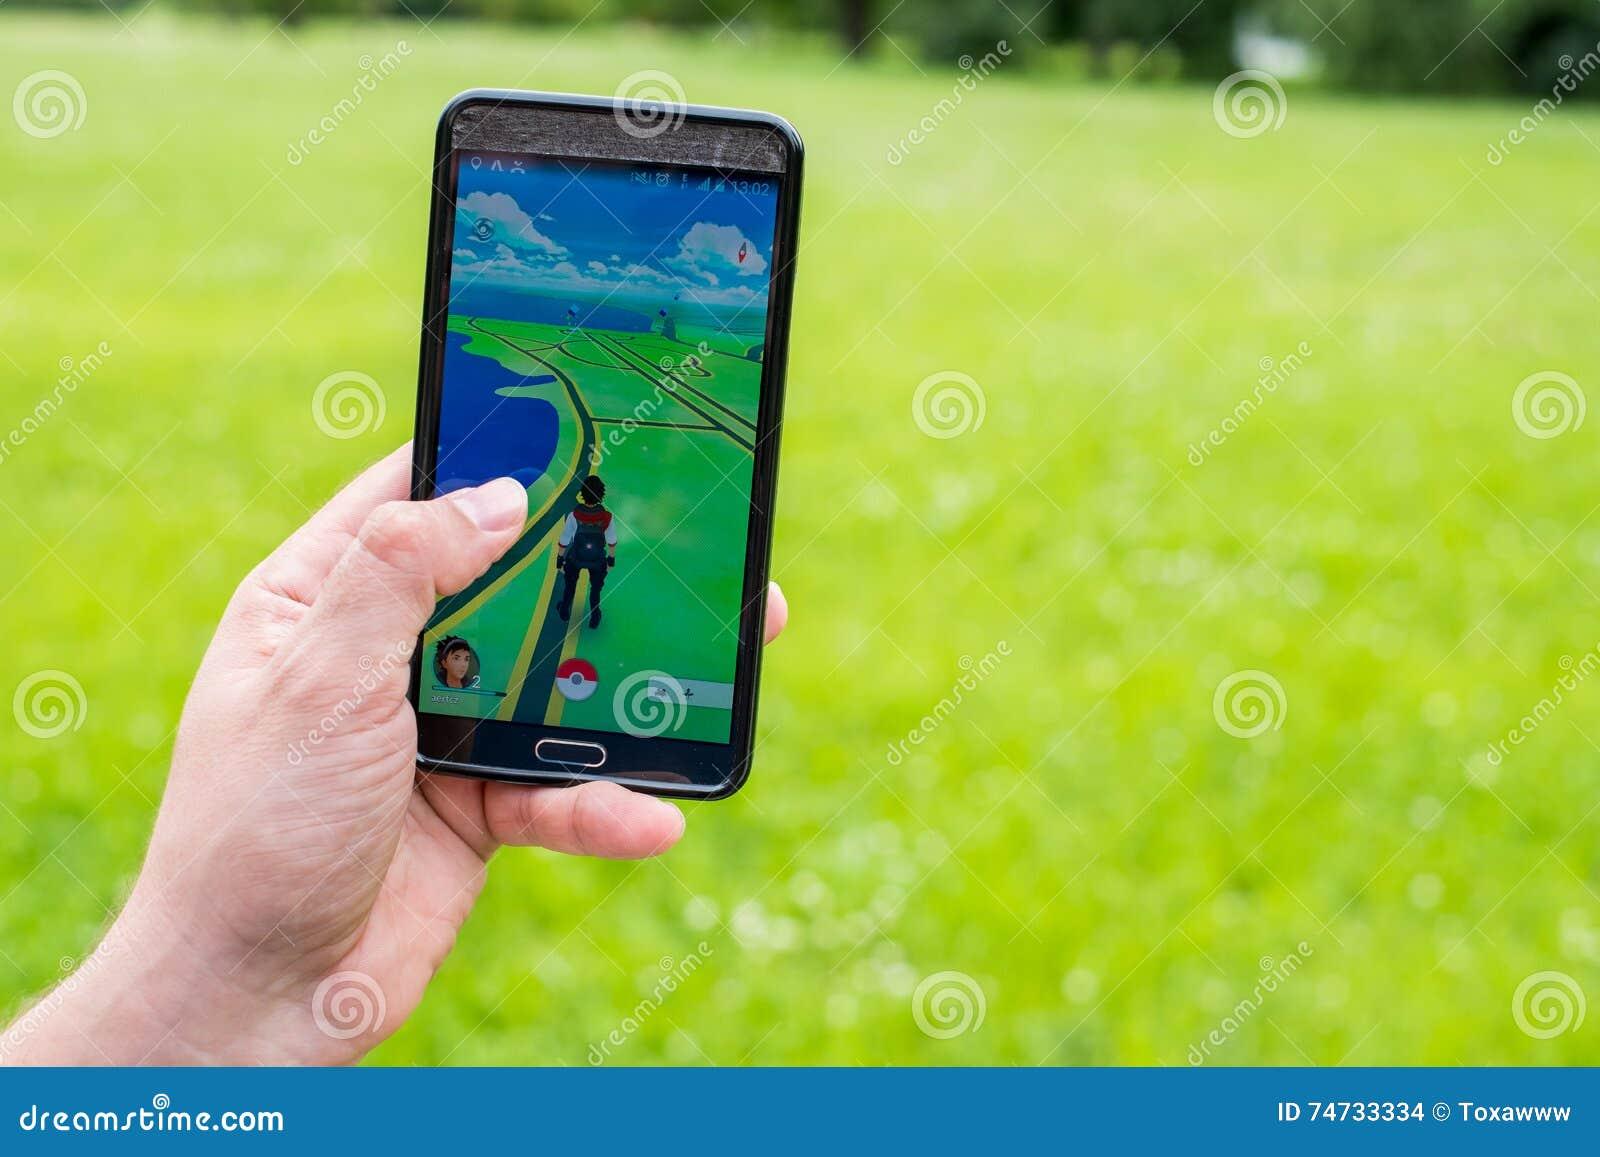 Pokemon Go Application On The Smartphone Editorial Stock